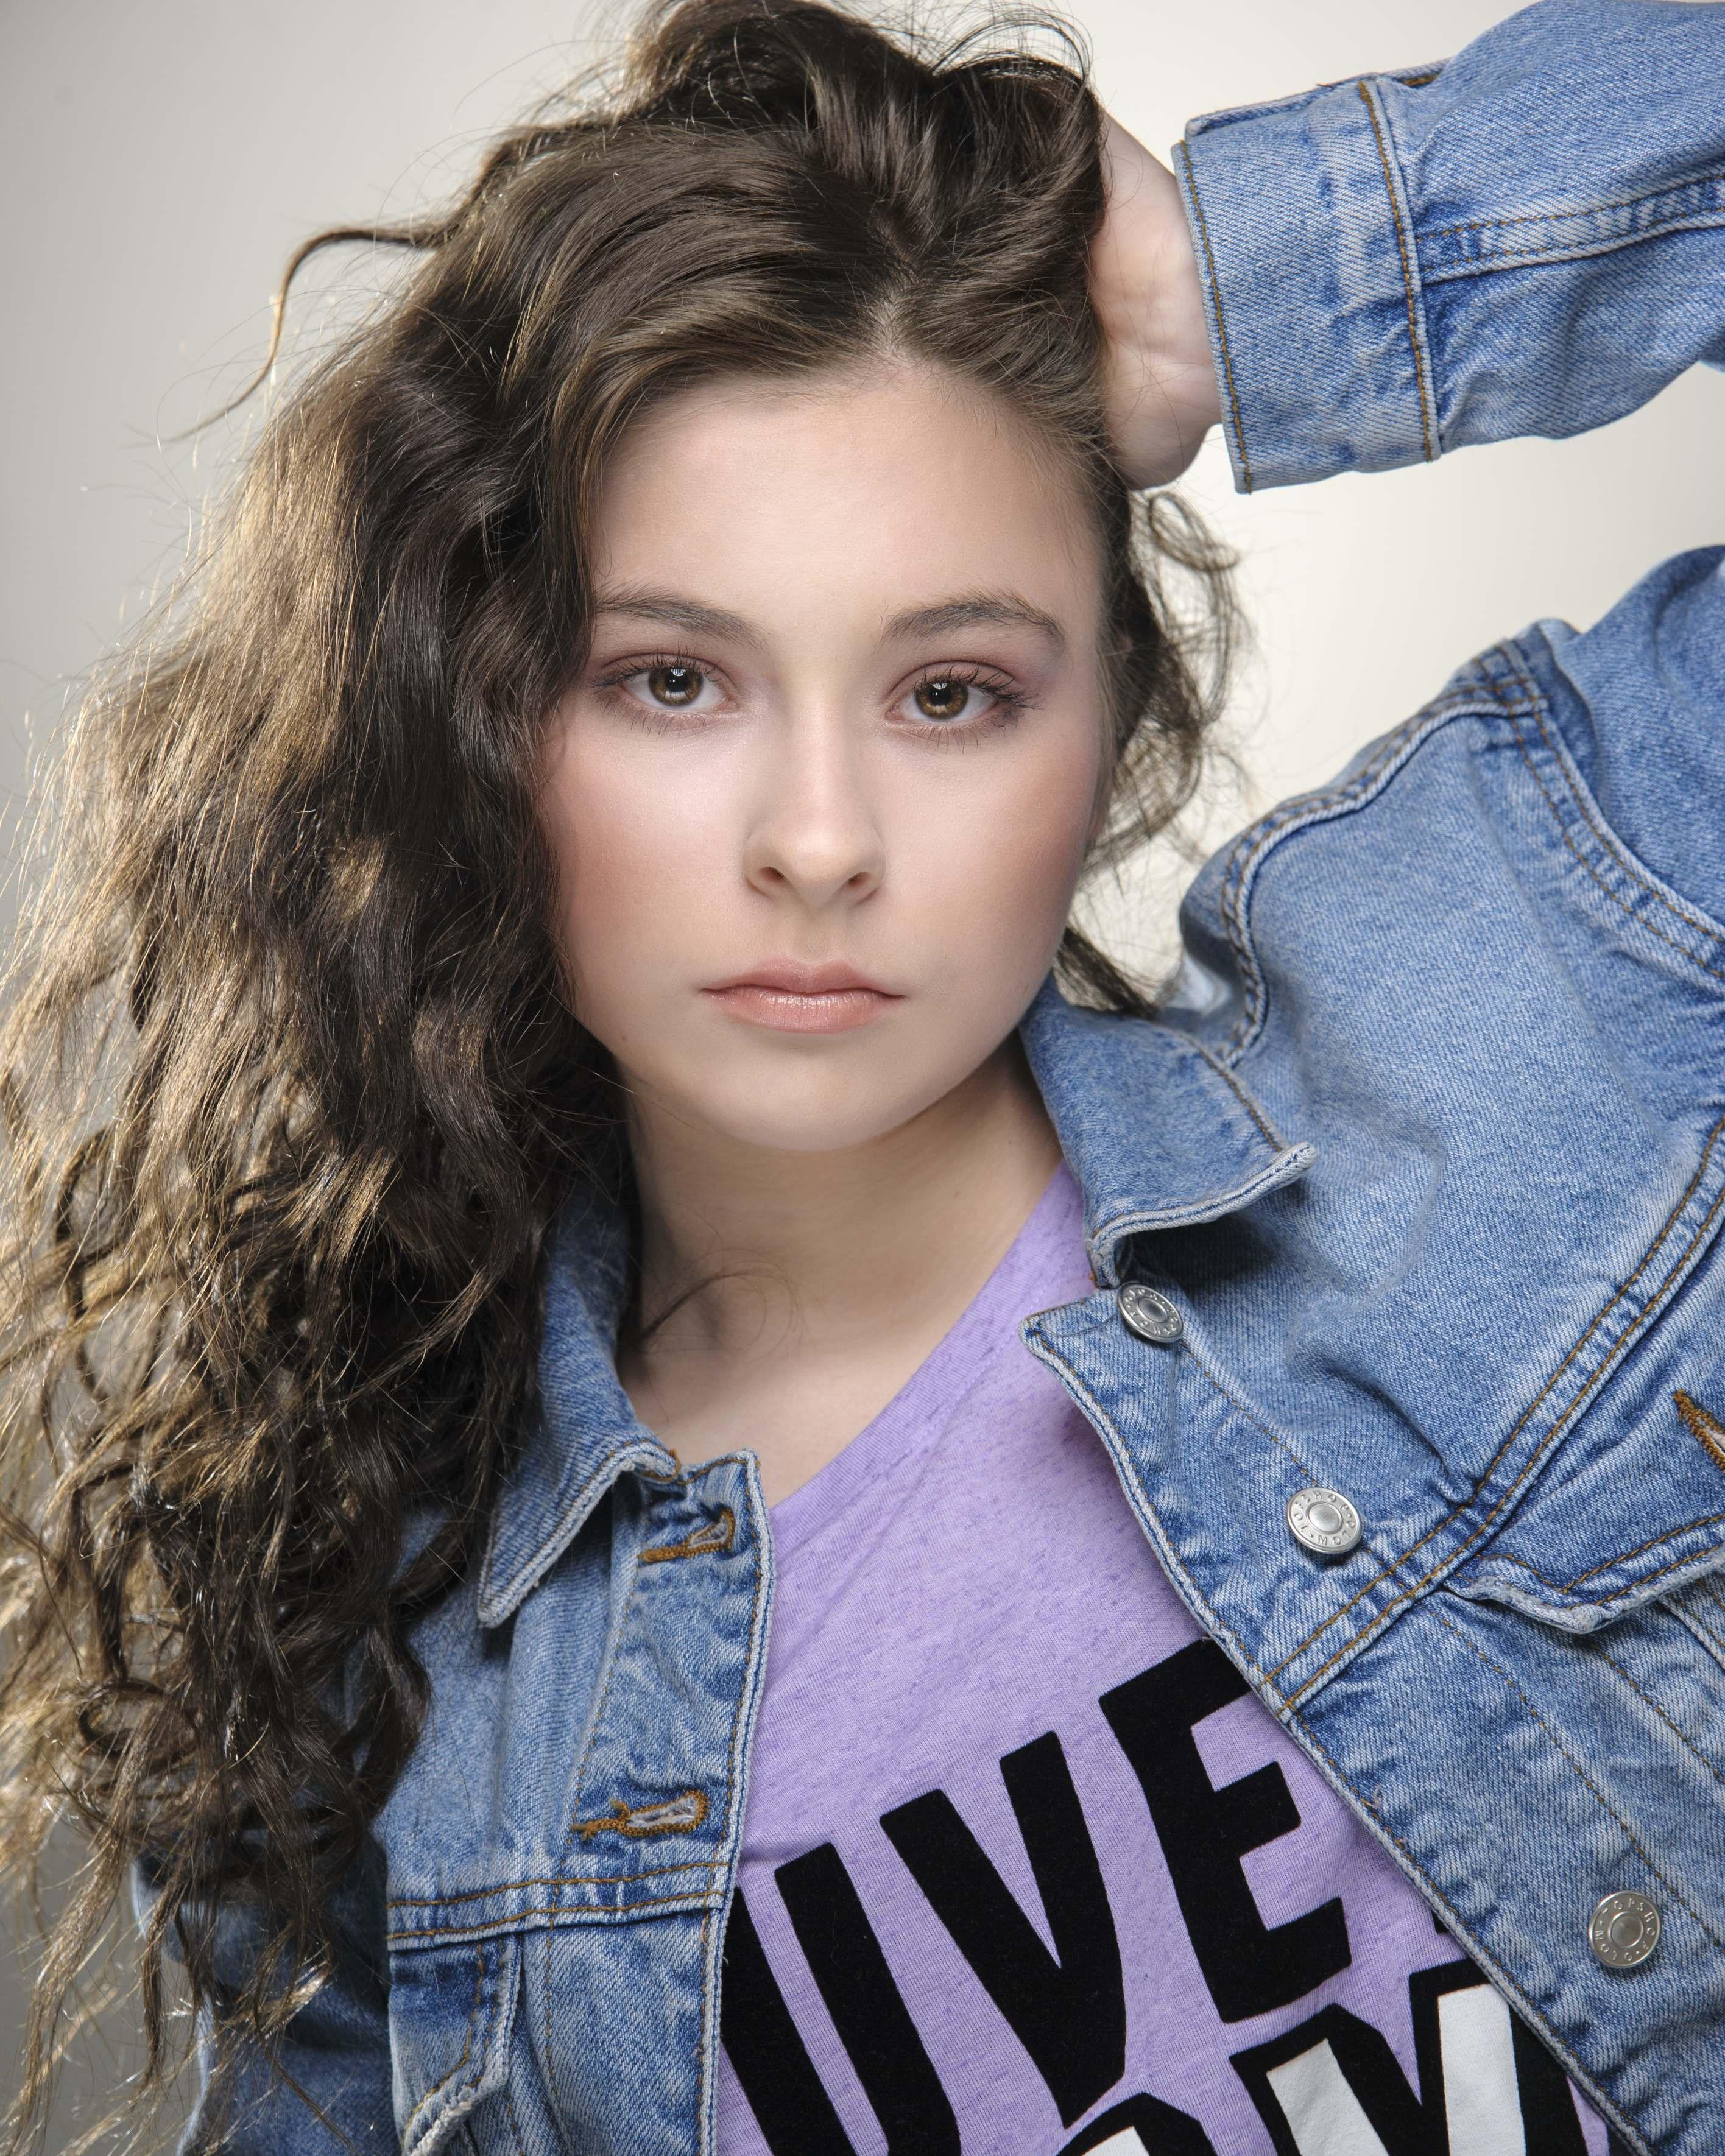 Web-Shine-Model-Female-Leeds-New-Face-Yorkshire-Anita-01.jpg#asset:45780